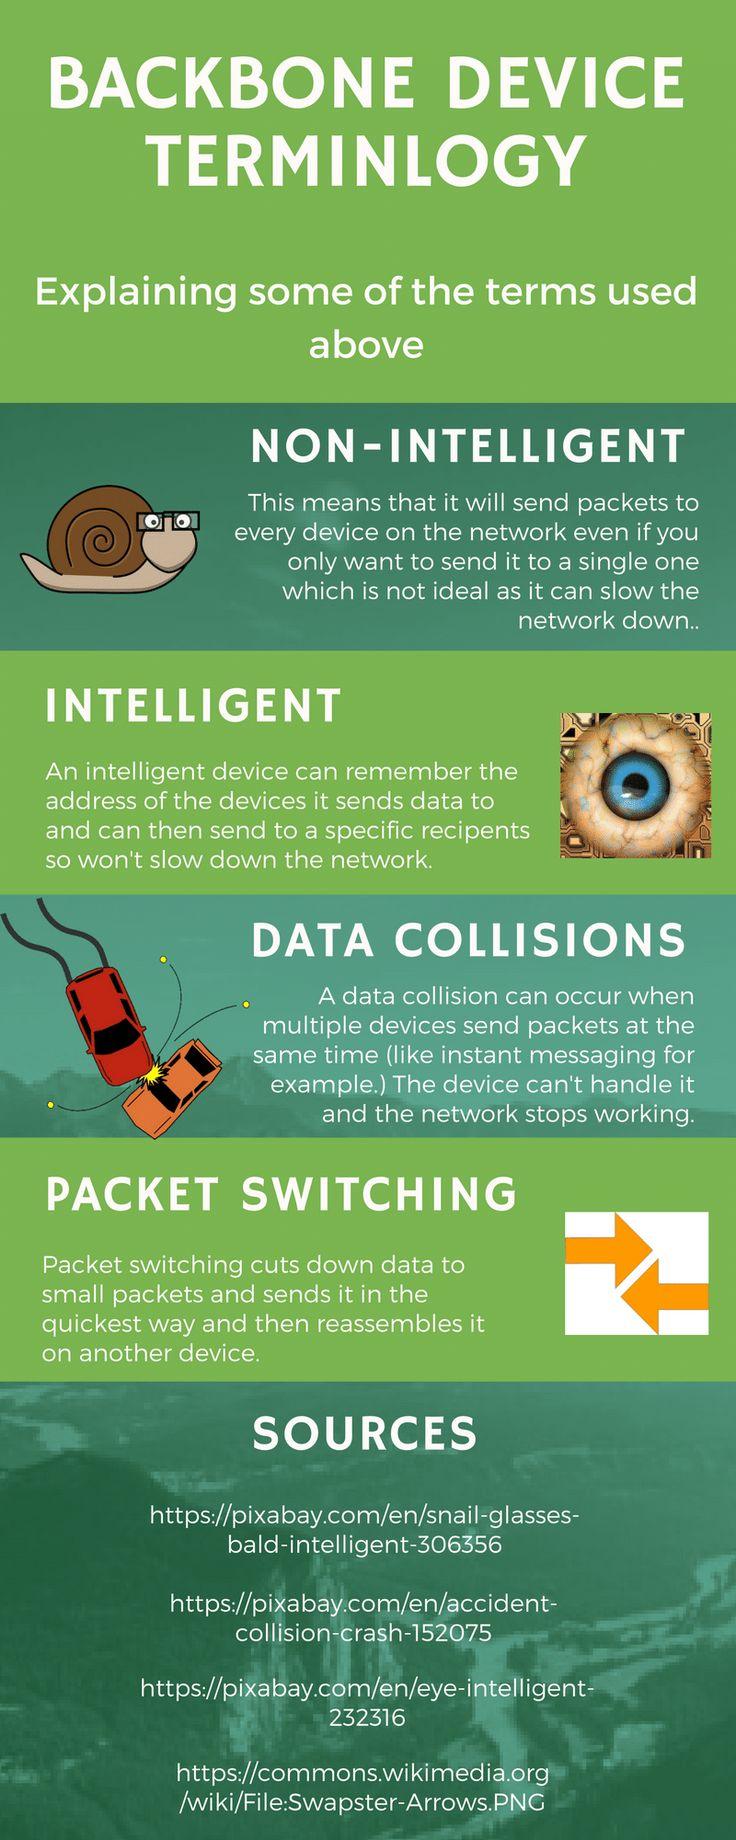 Part 2: Backbone Device Terminology